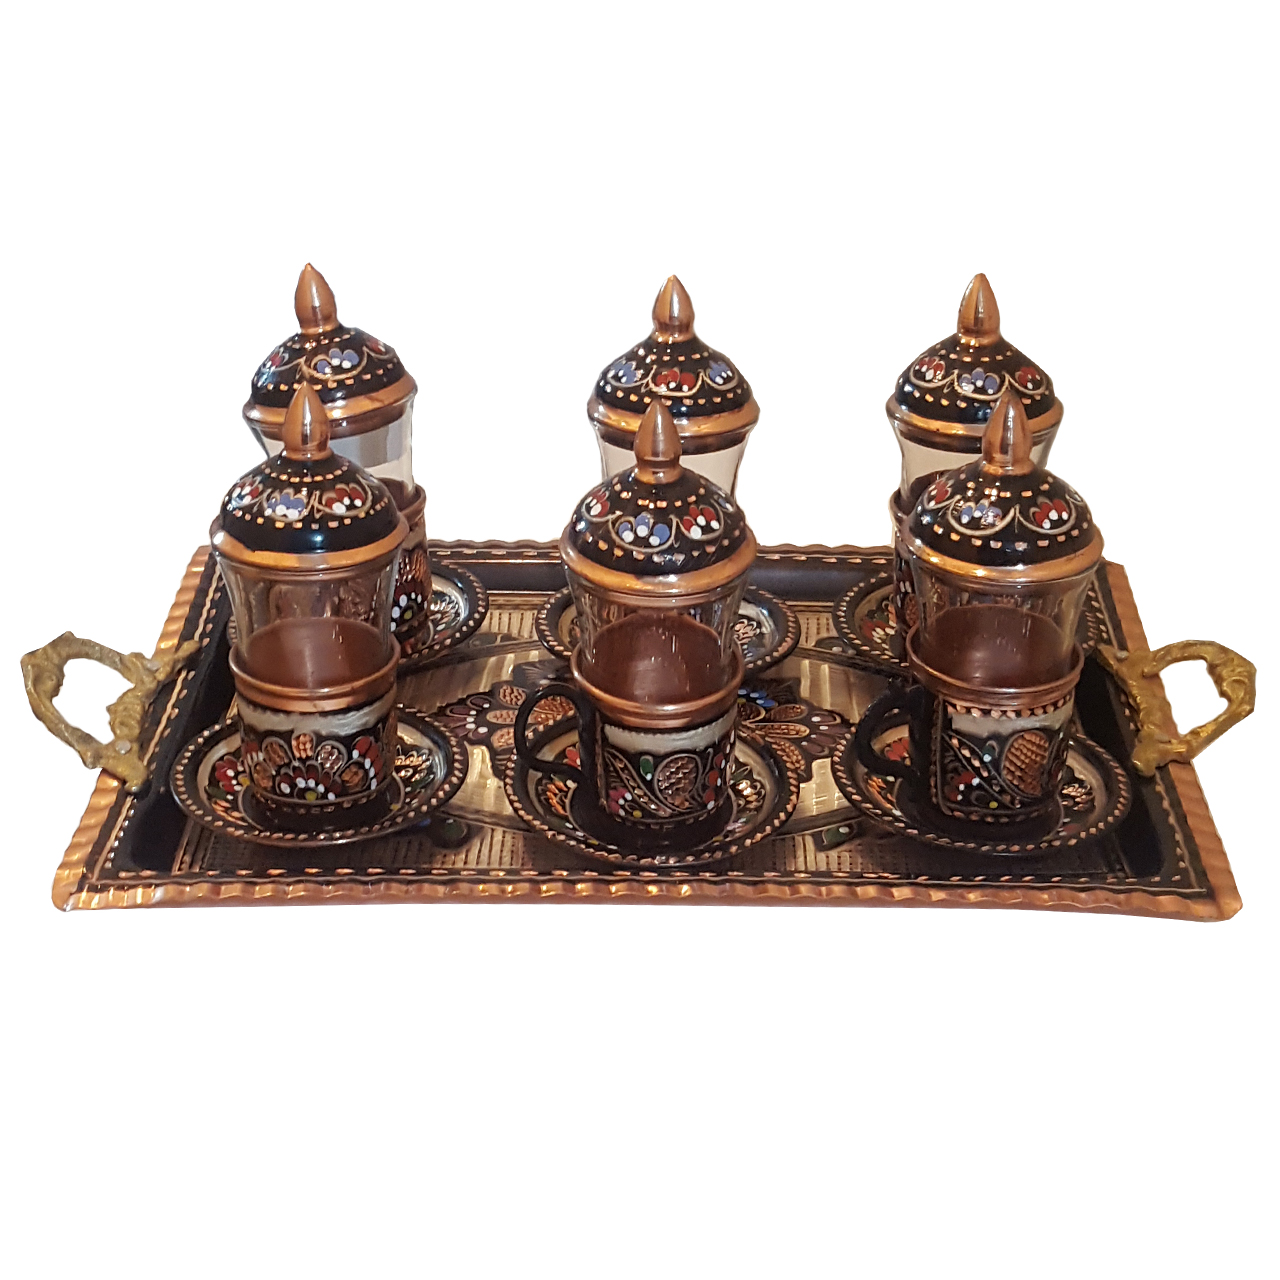 سرویس چای خوری قلمزنی مدل 1189